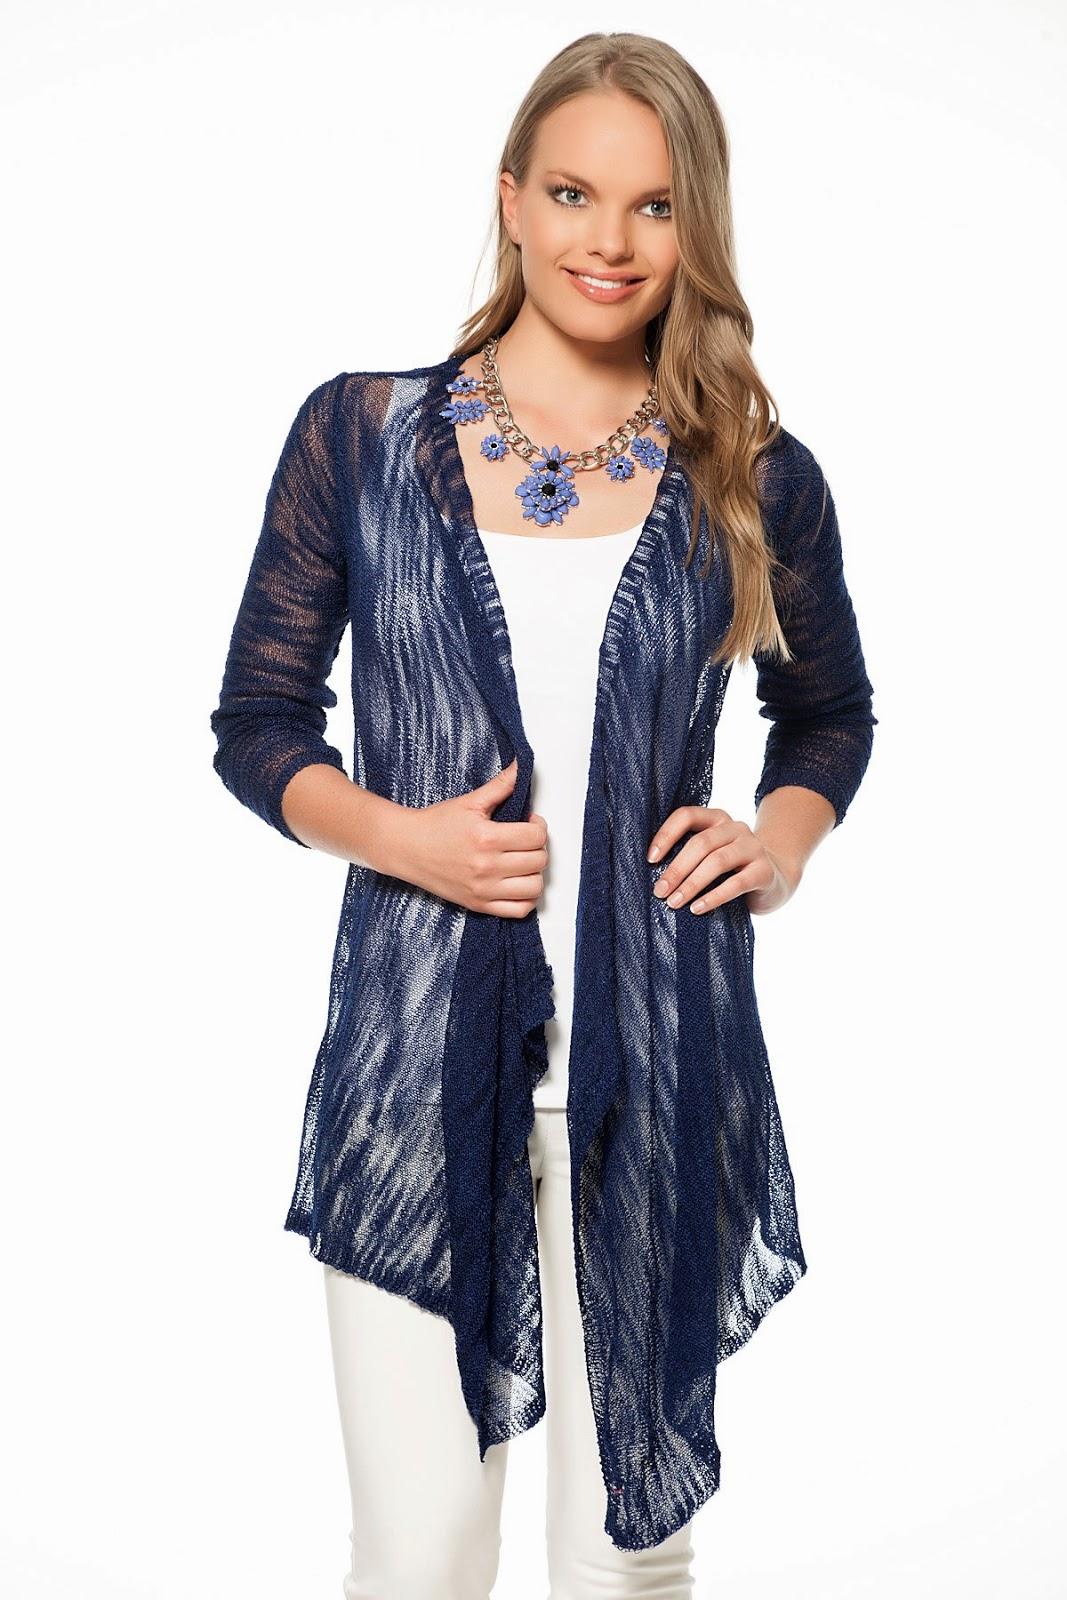 3b122c28affa4 Online Giyim Alışveriş: Ekol Giyim Sitesi